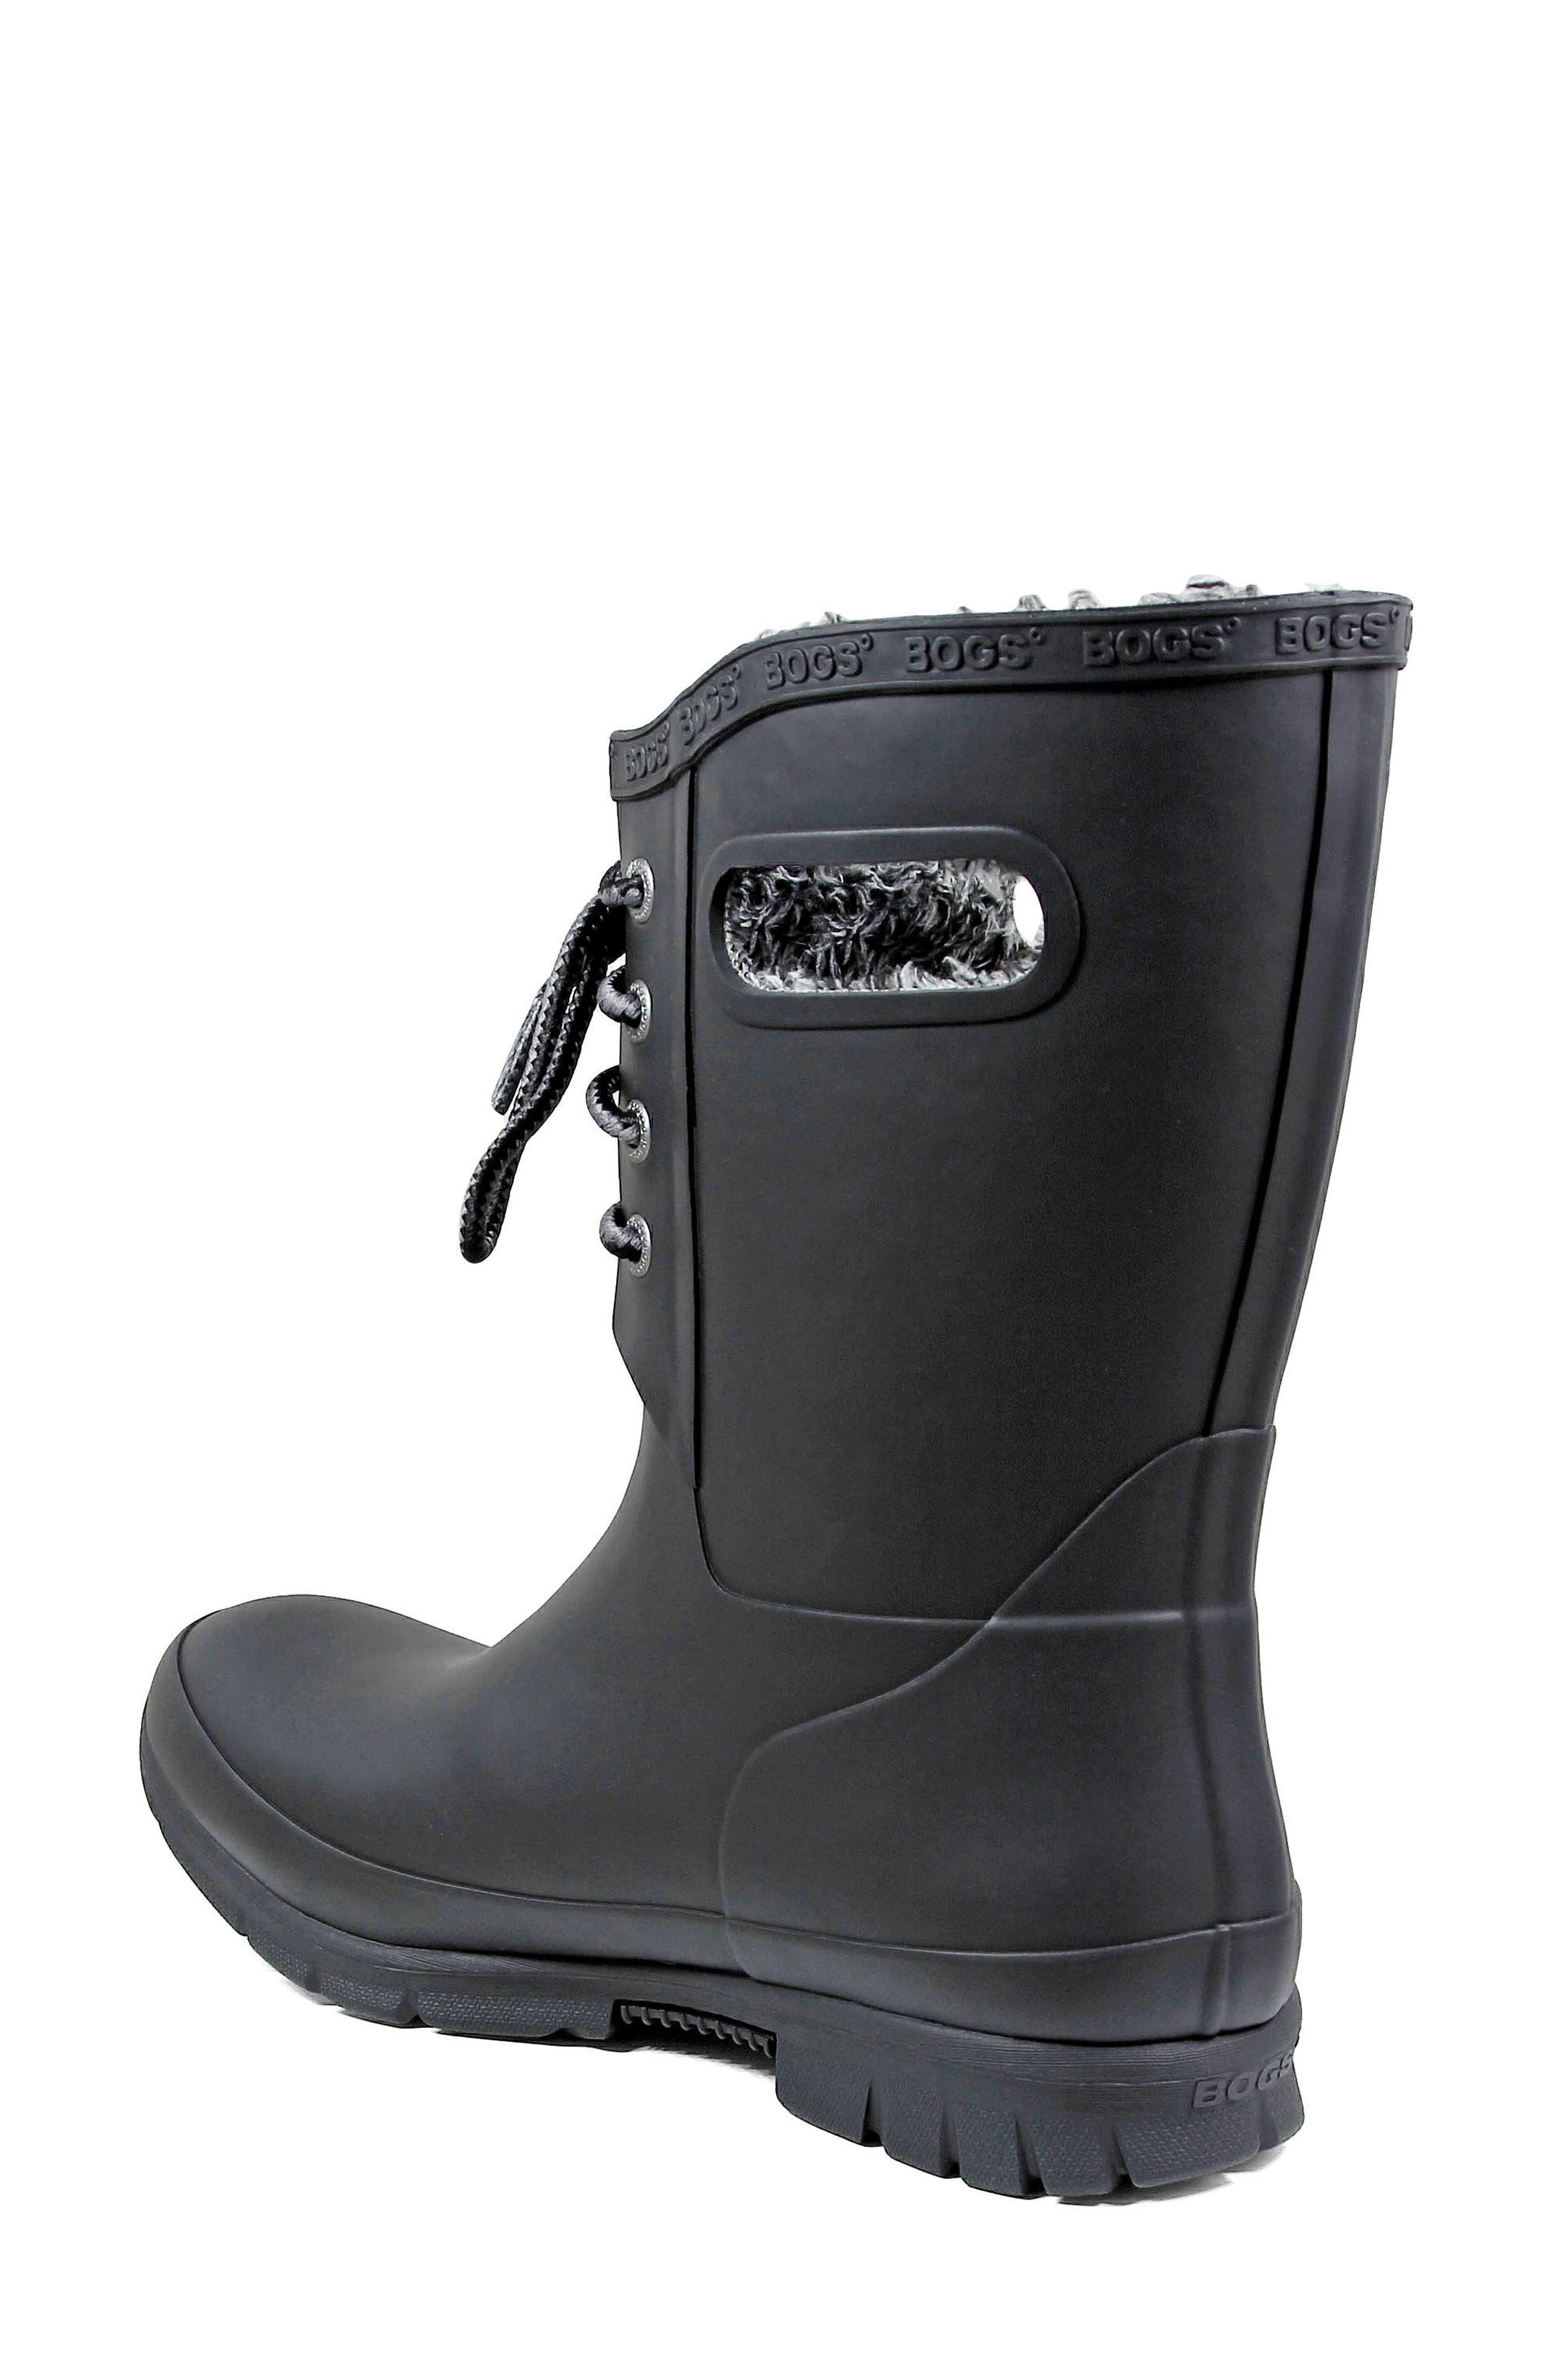 BOGS, Amanda Plush Waterproof Rain Boot, Alternate thumbnail 2, color, 001